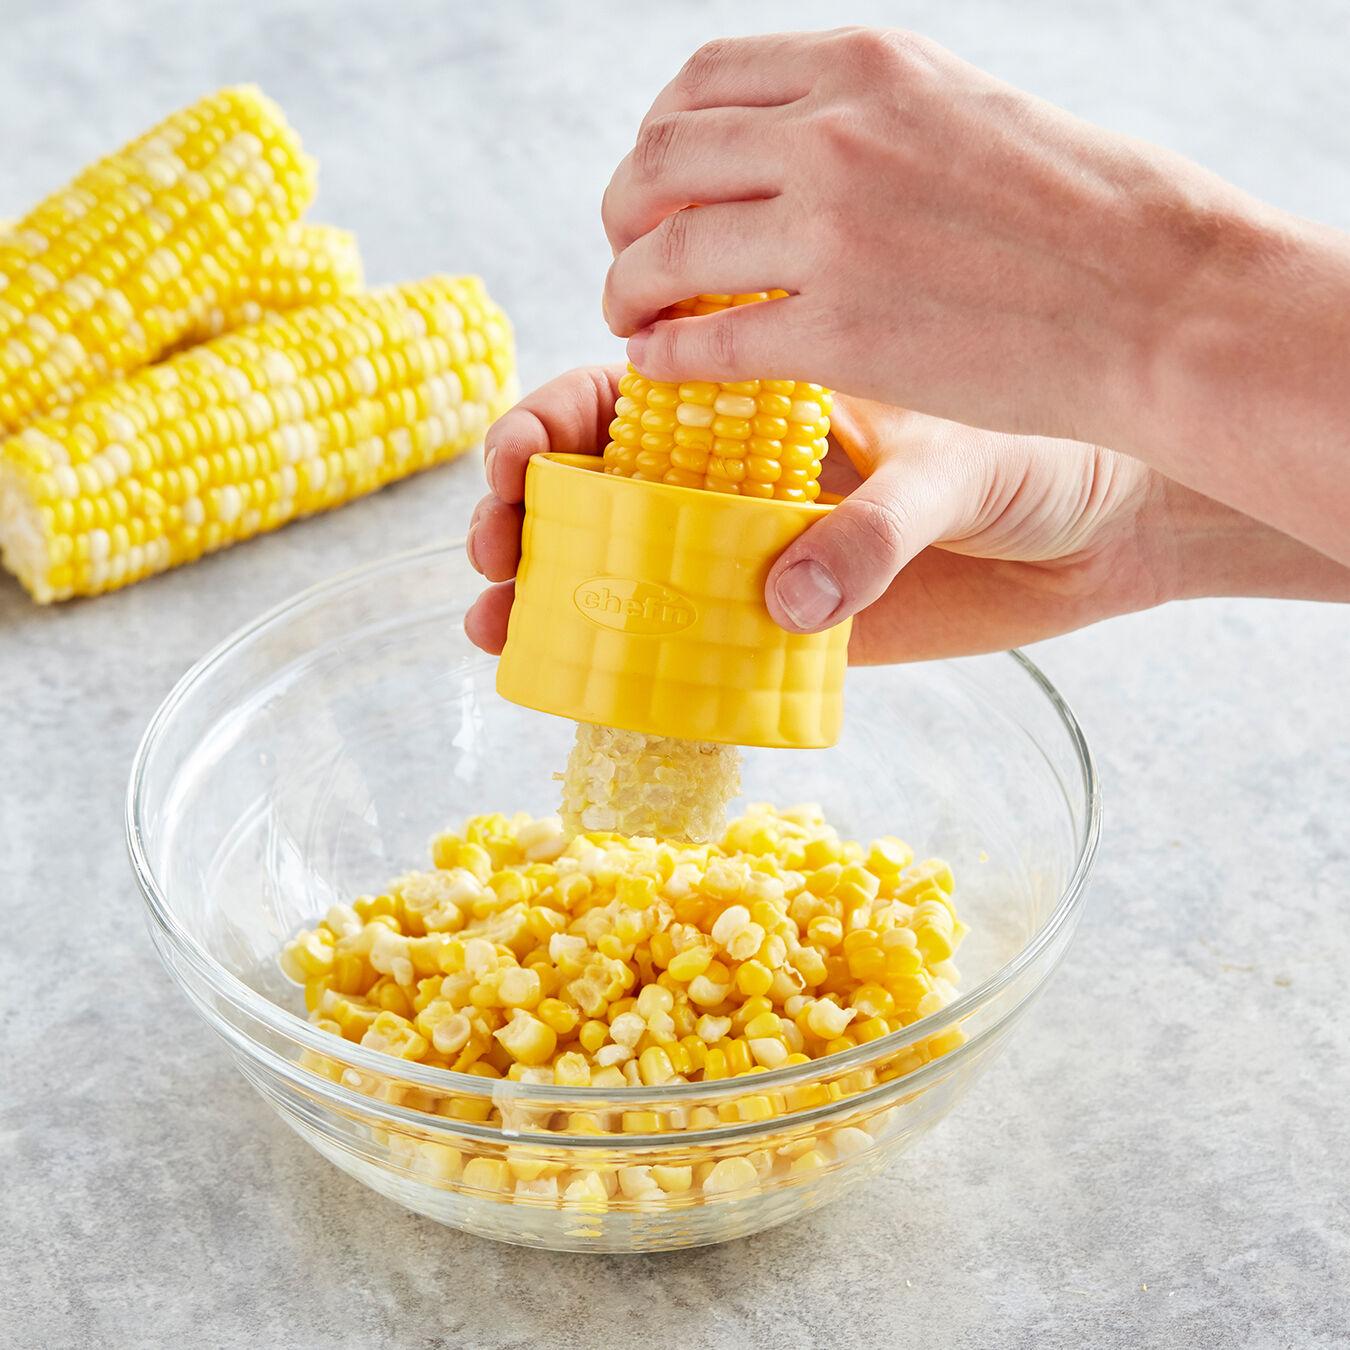 Chef/'n Cob Corn Stripper Yellow  Safely strip entire ear of corn  #102-812-017